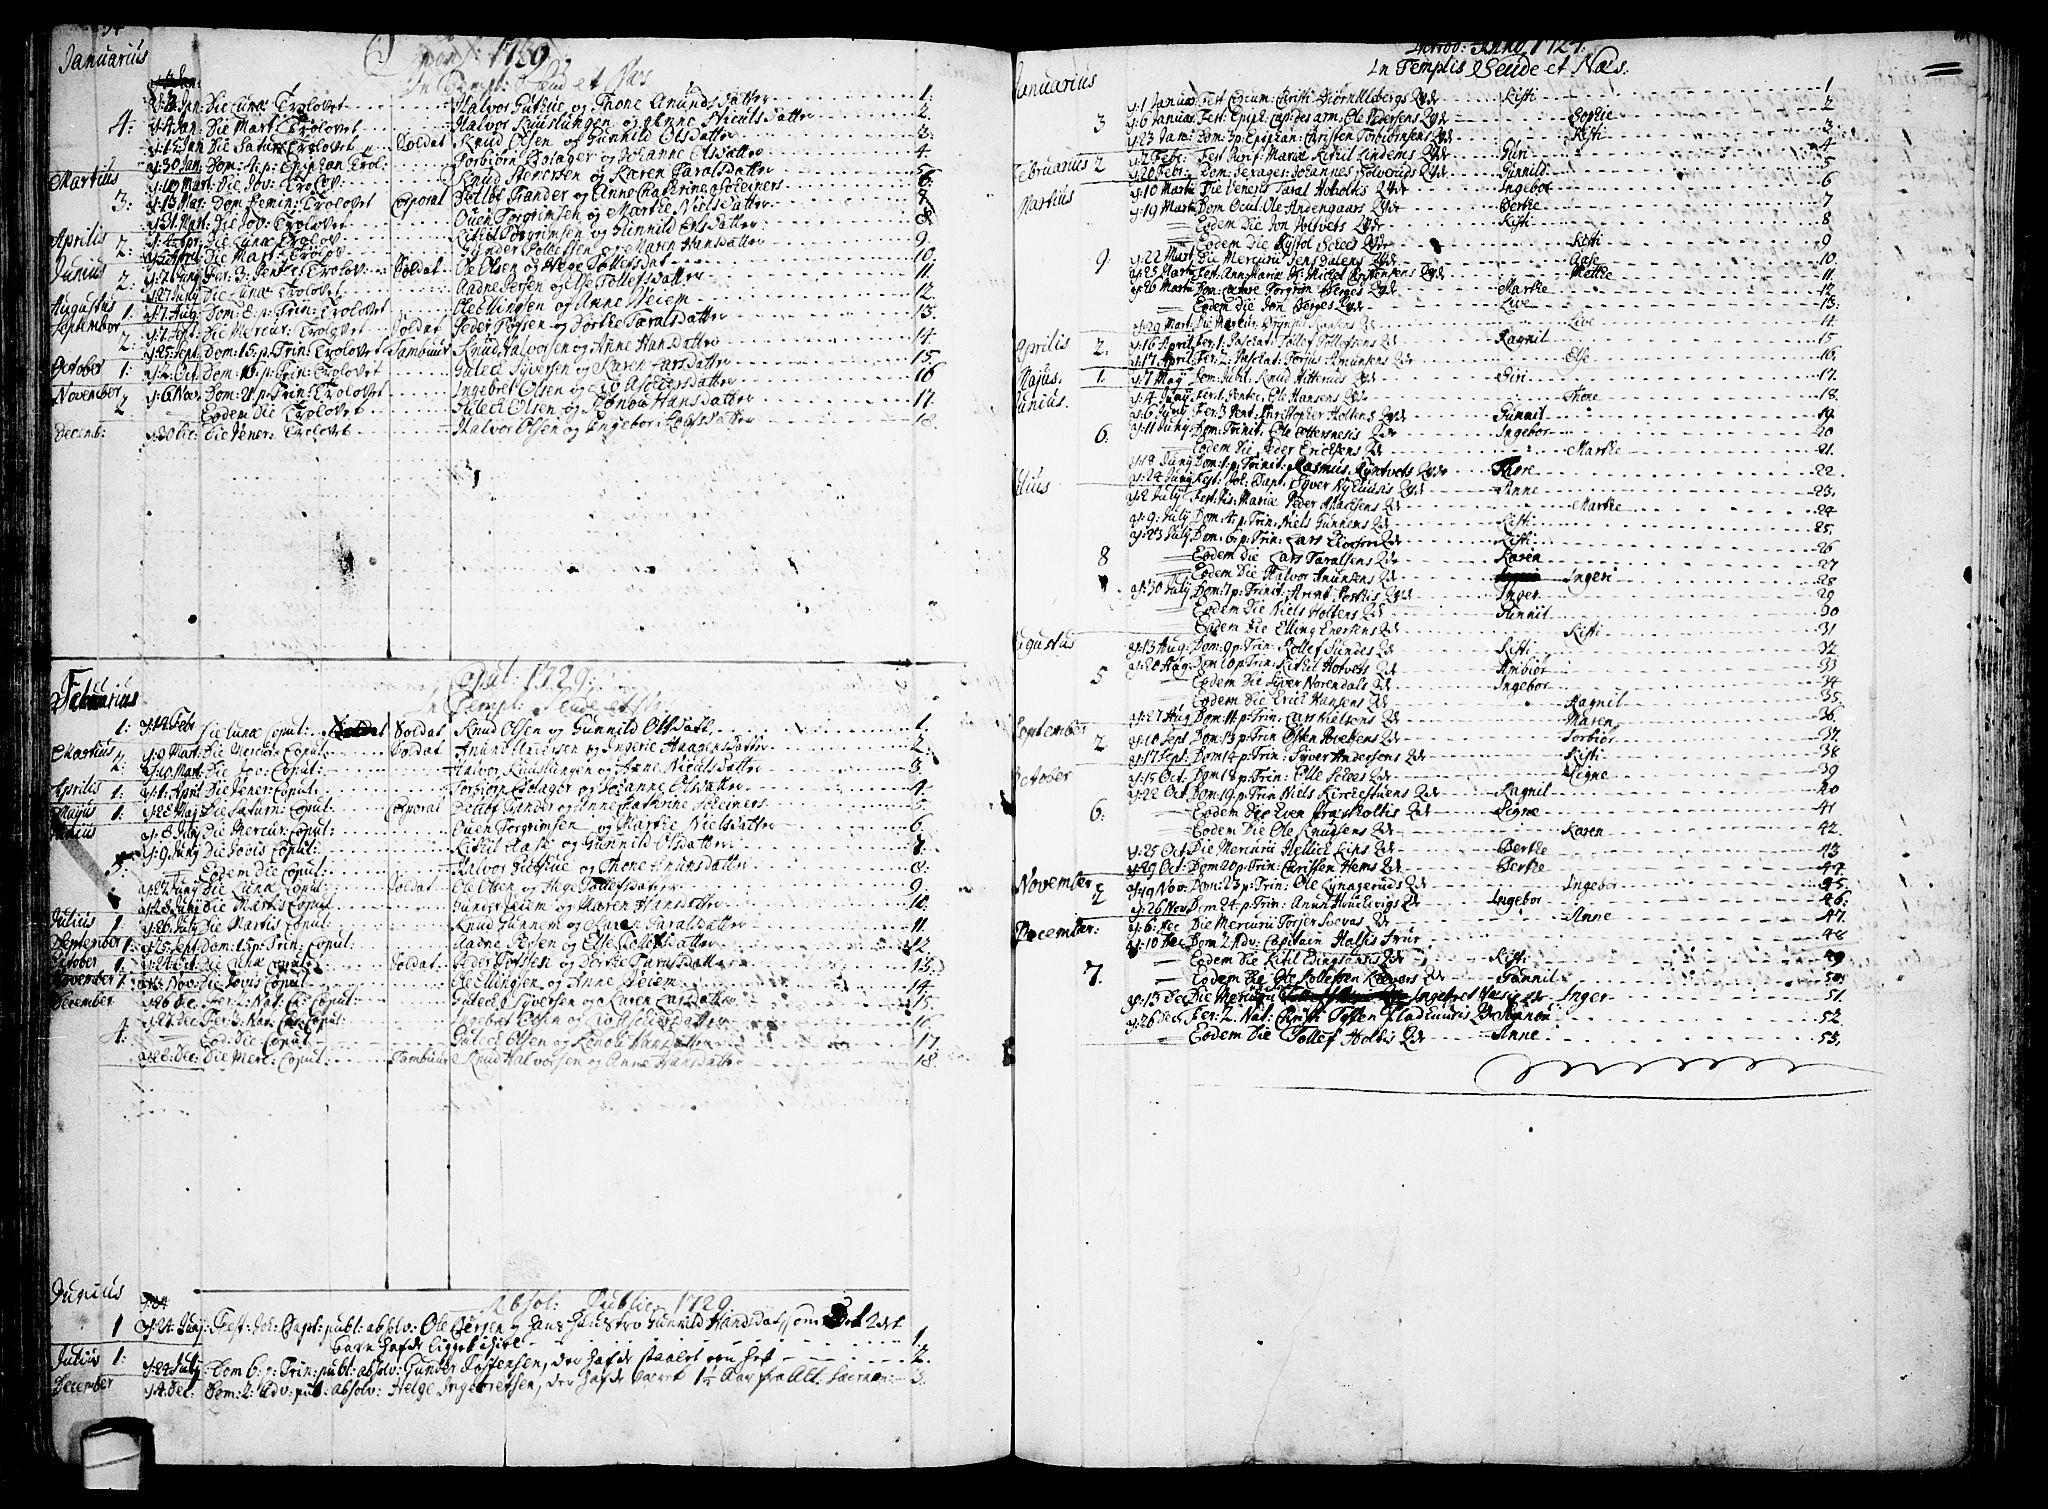 SAKO, Sauherad kirkebøker, F/Fa/L0003: Ministerialbok nr. I 3, 1722-1766, s. 34-35